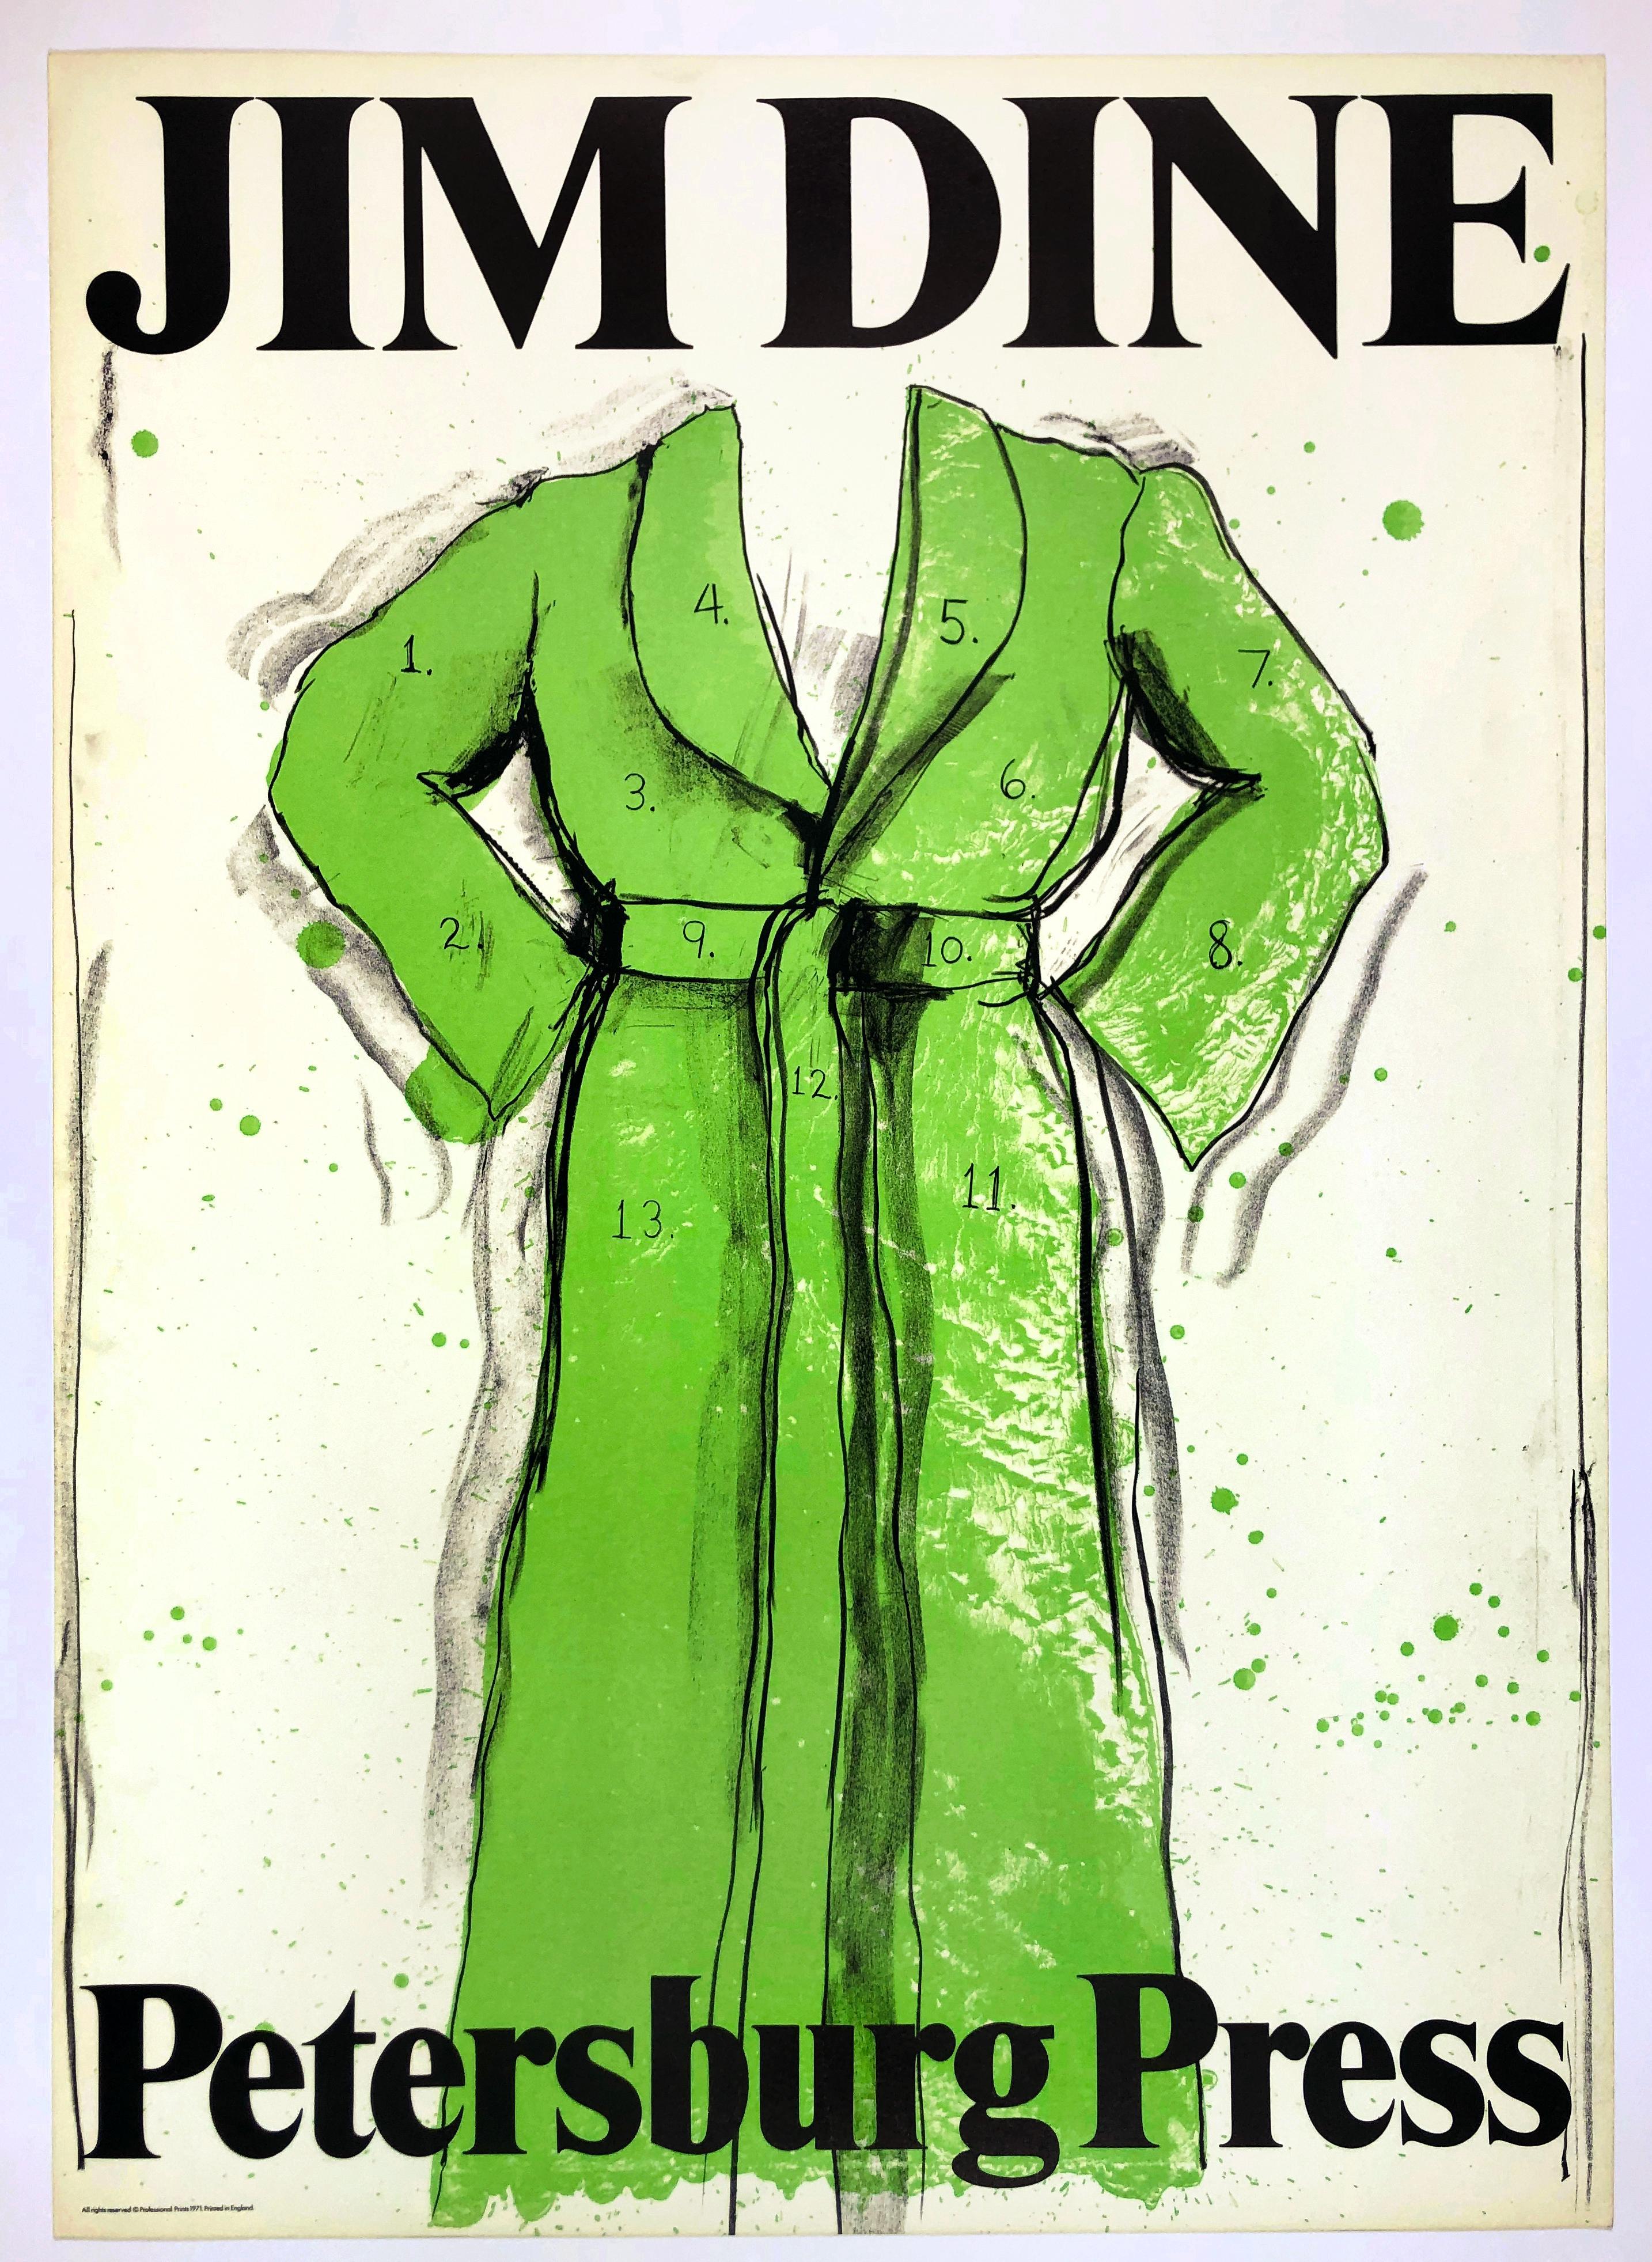 Vintage Jim Dine Green Bathrobe exhibition poster, 1970s retro pop art font